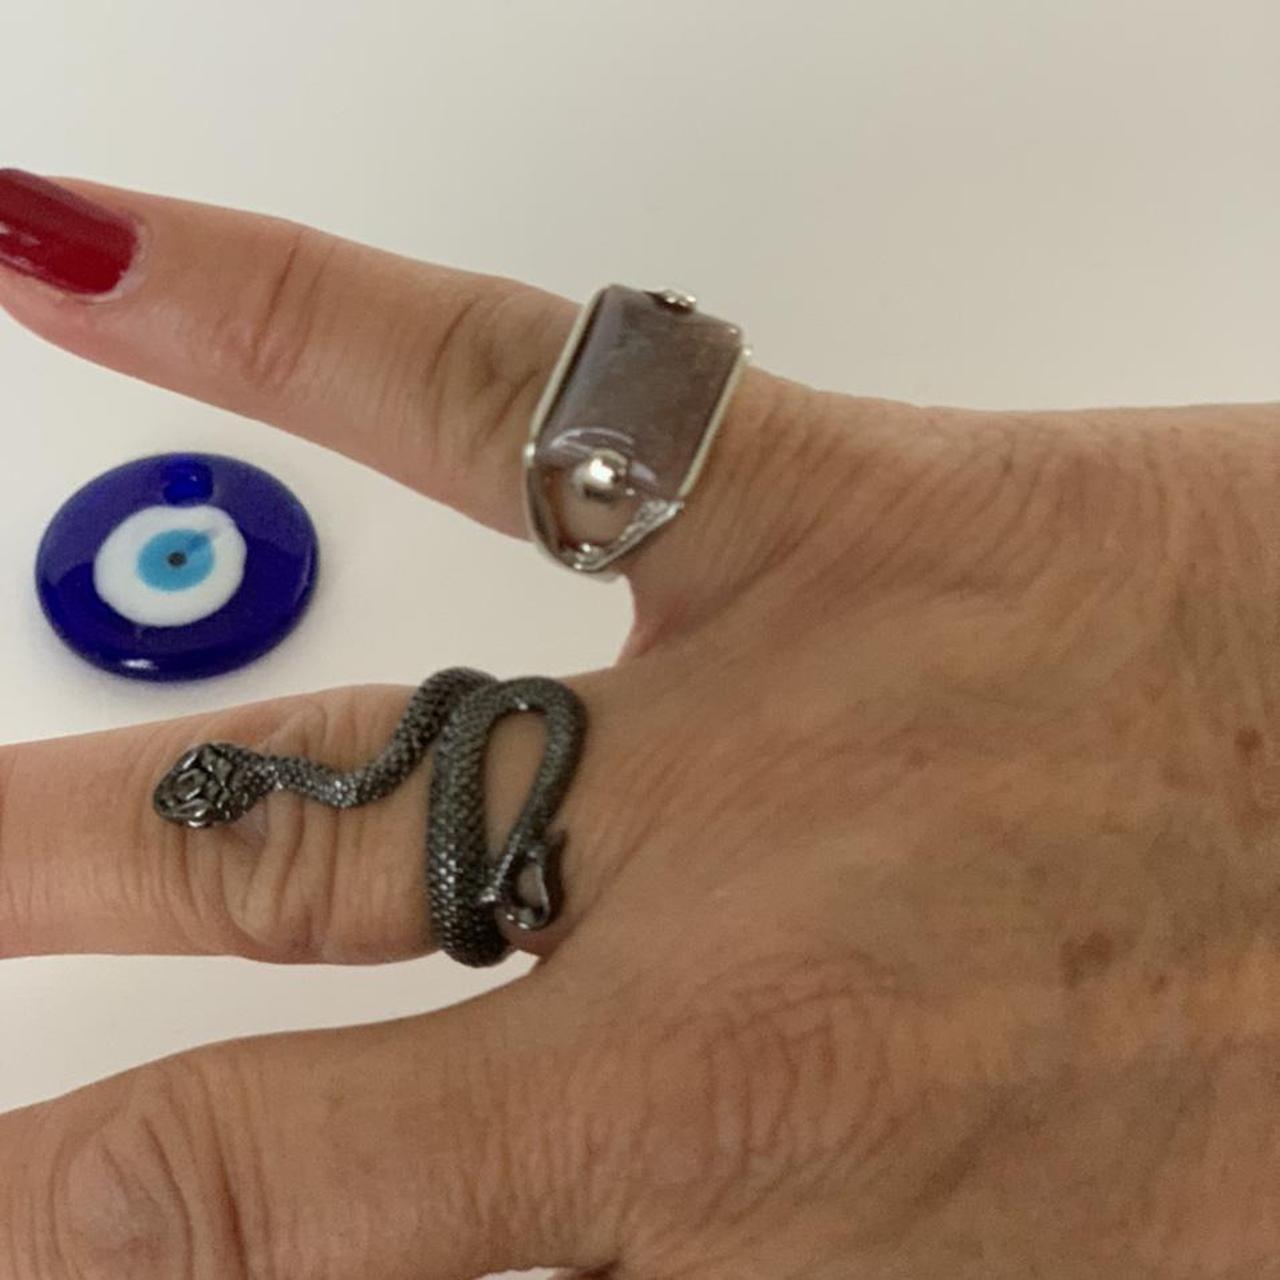 Product Image 1 - Ring set of 2 $16 Free